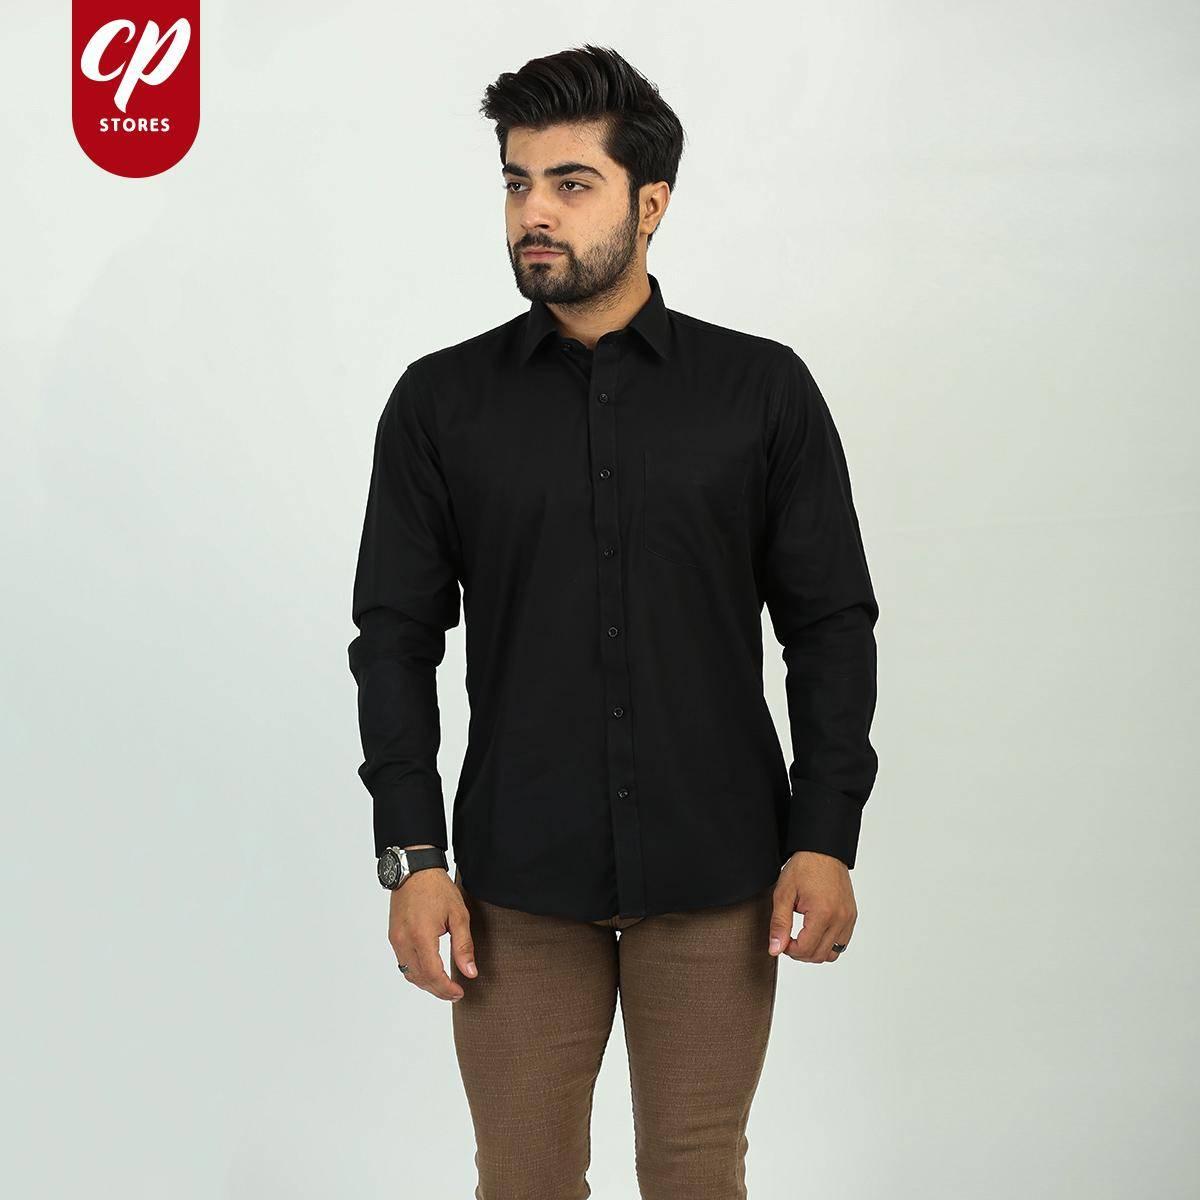 Cut Price Formal Dress Shirt CT Premium Black